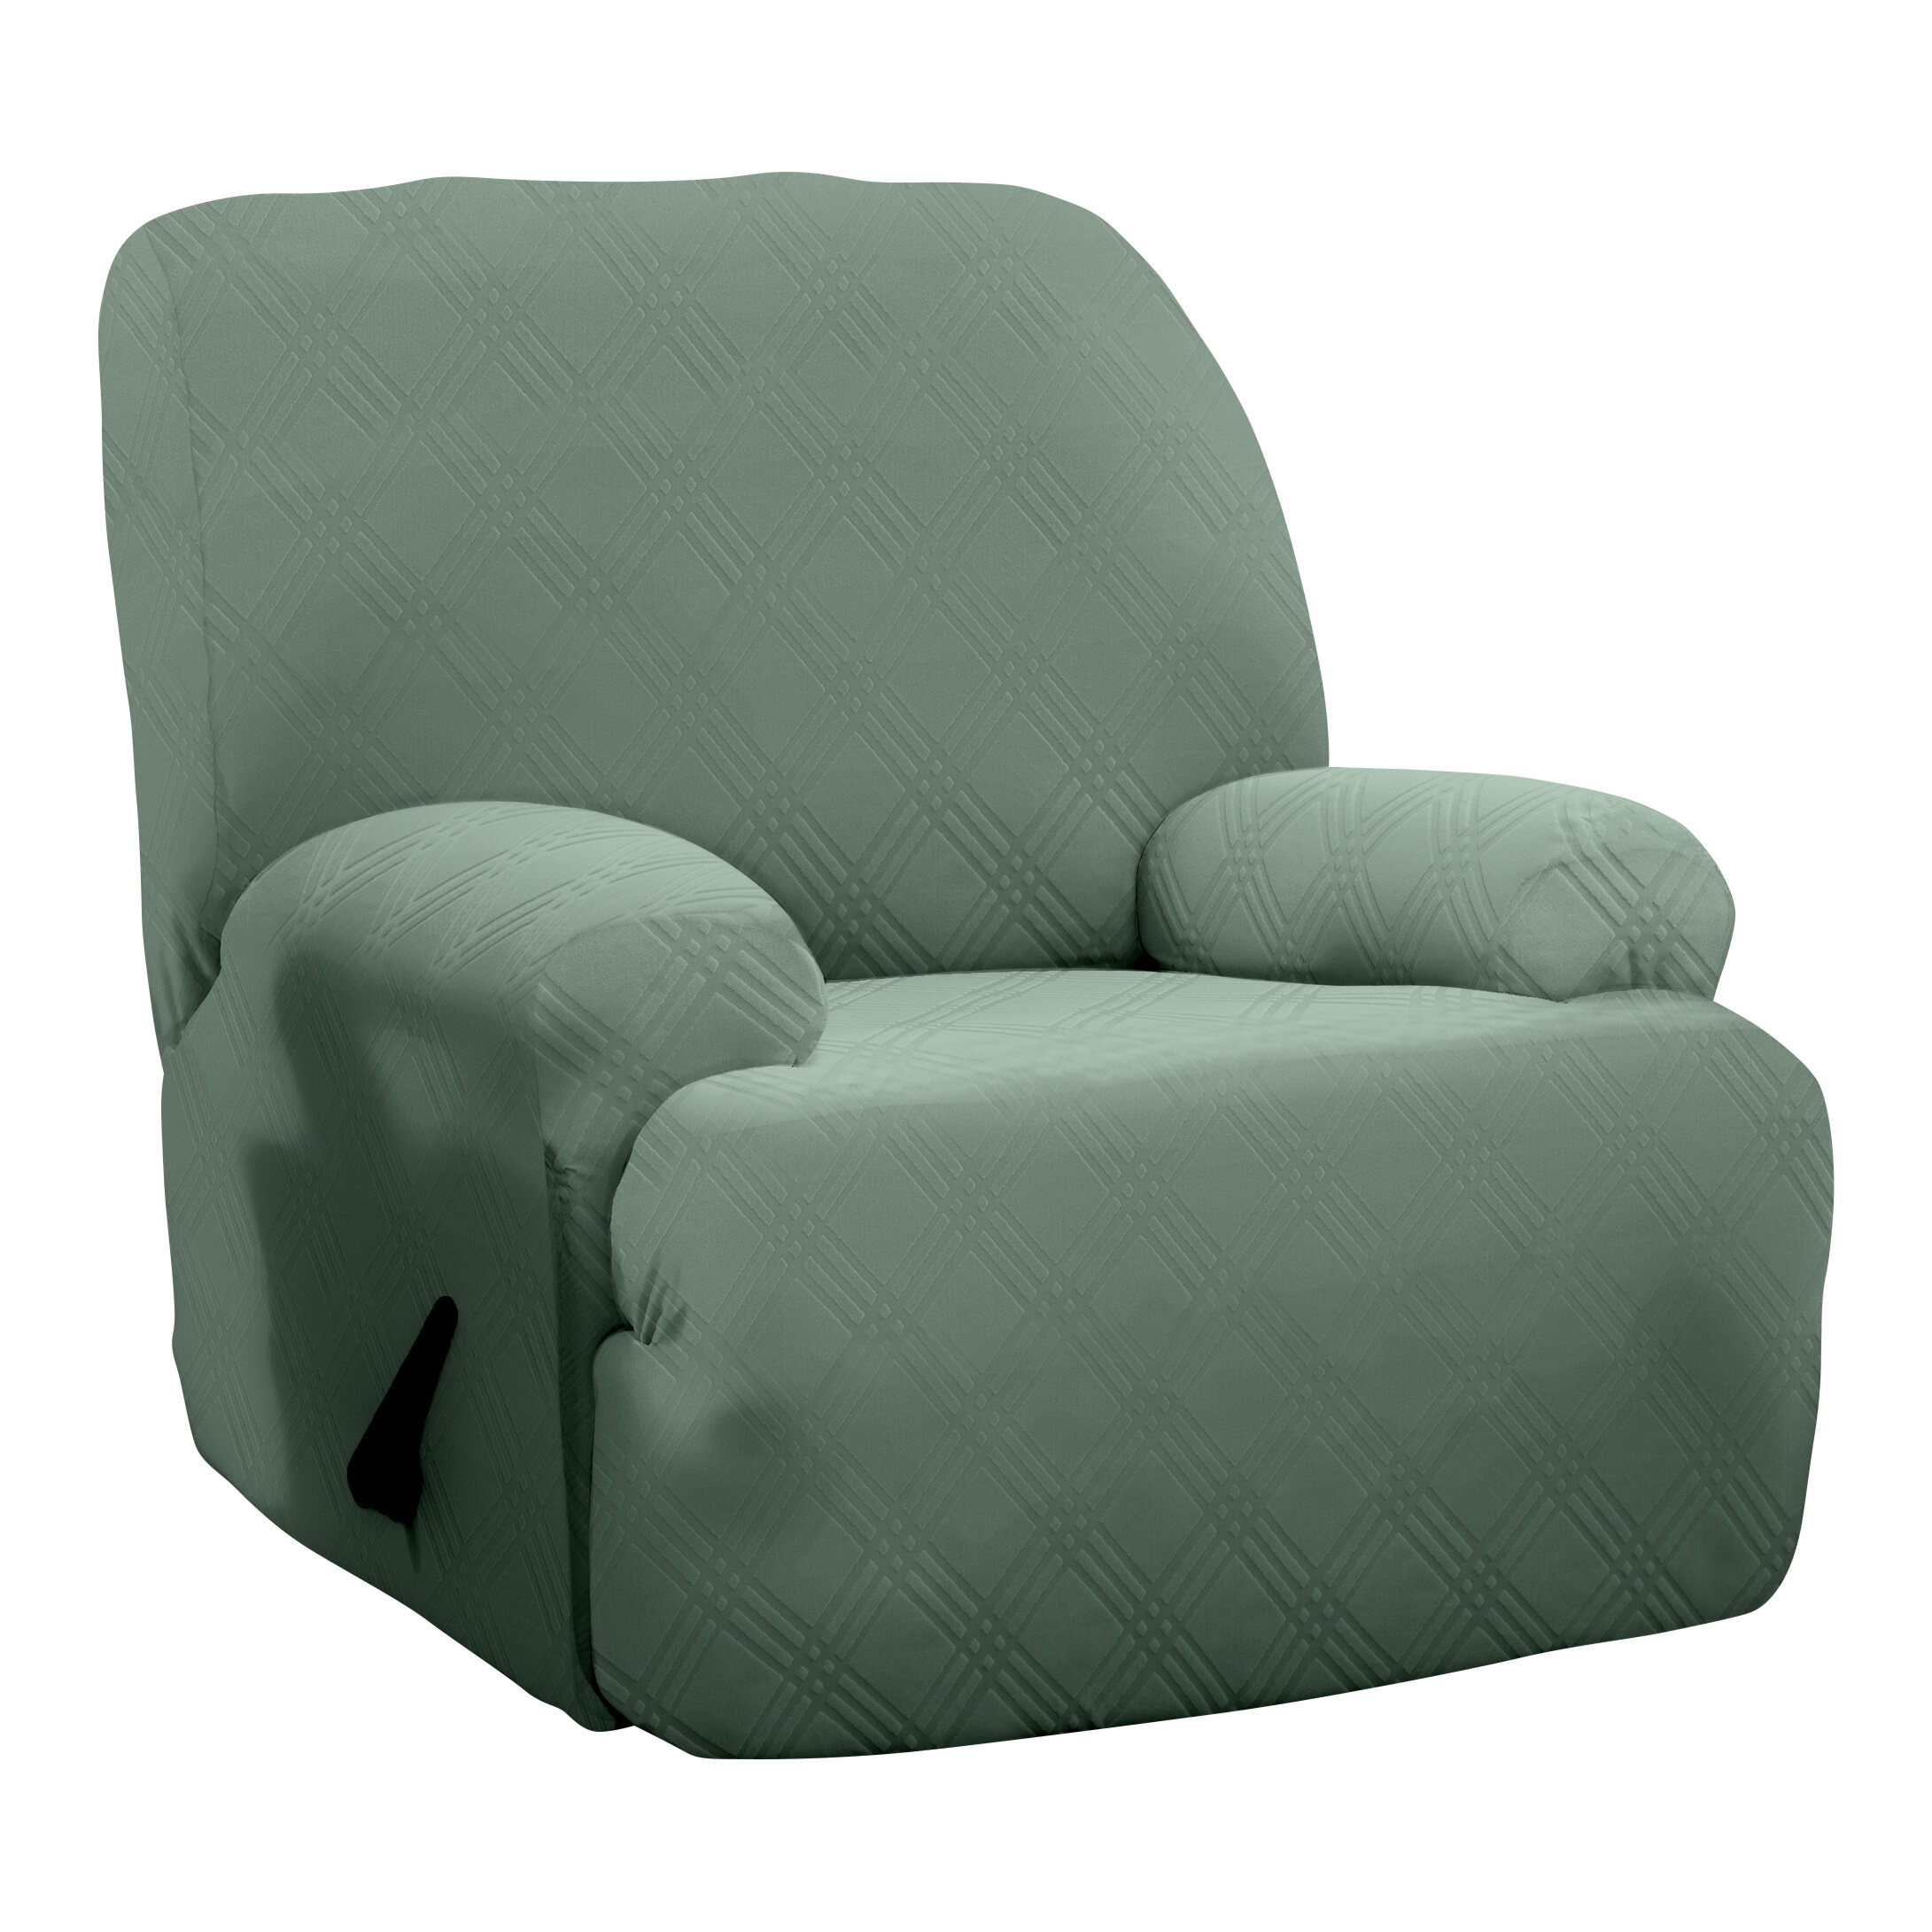 Red Barrel Studio Double Diamond Sensations Box Cushion Recliner Slipcover Reviews Wayfair